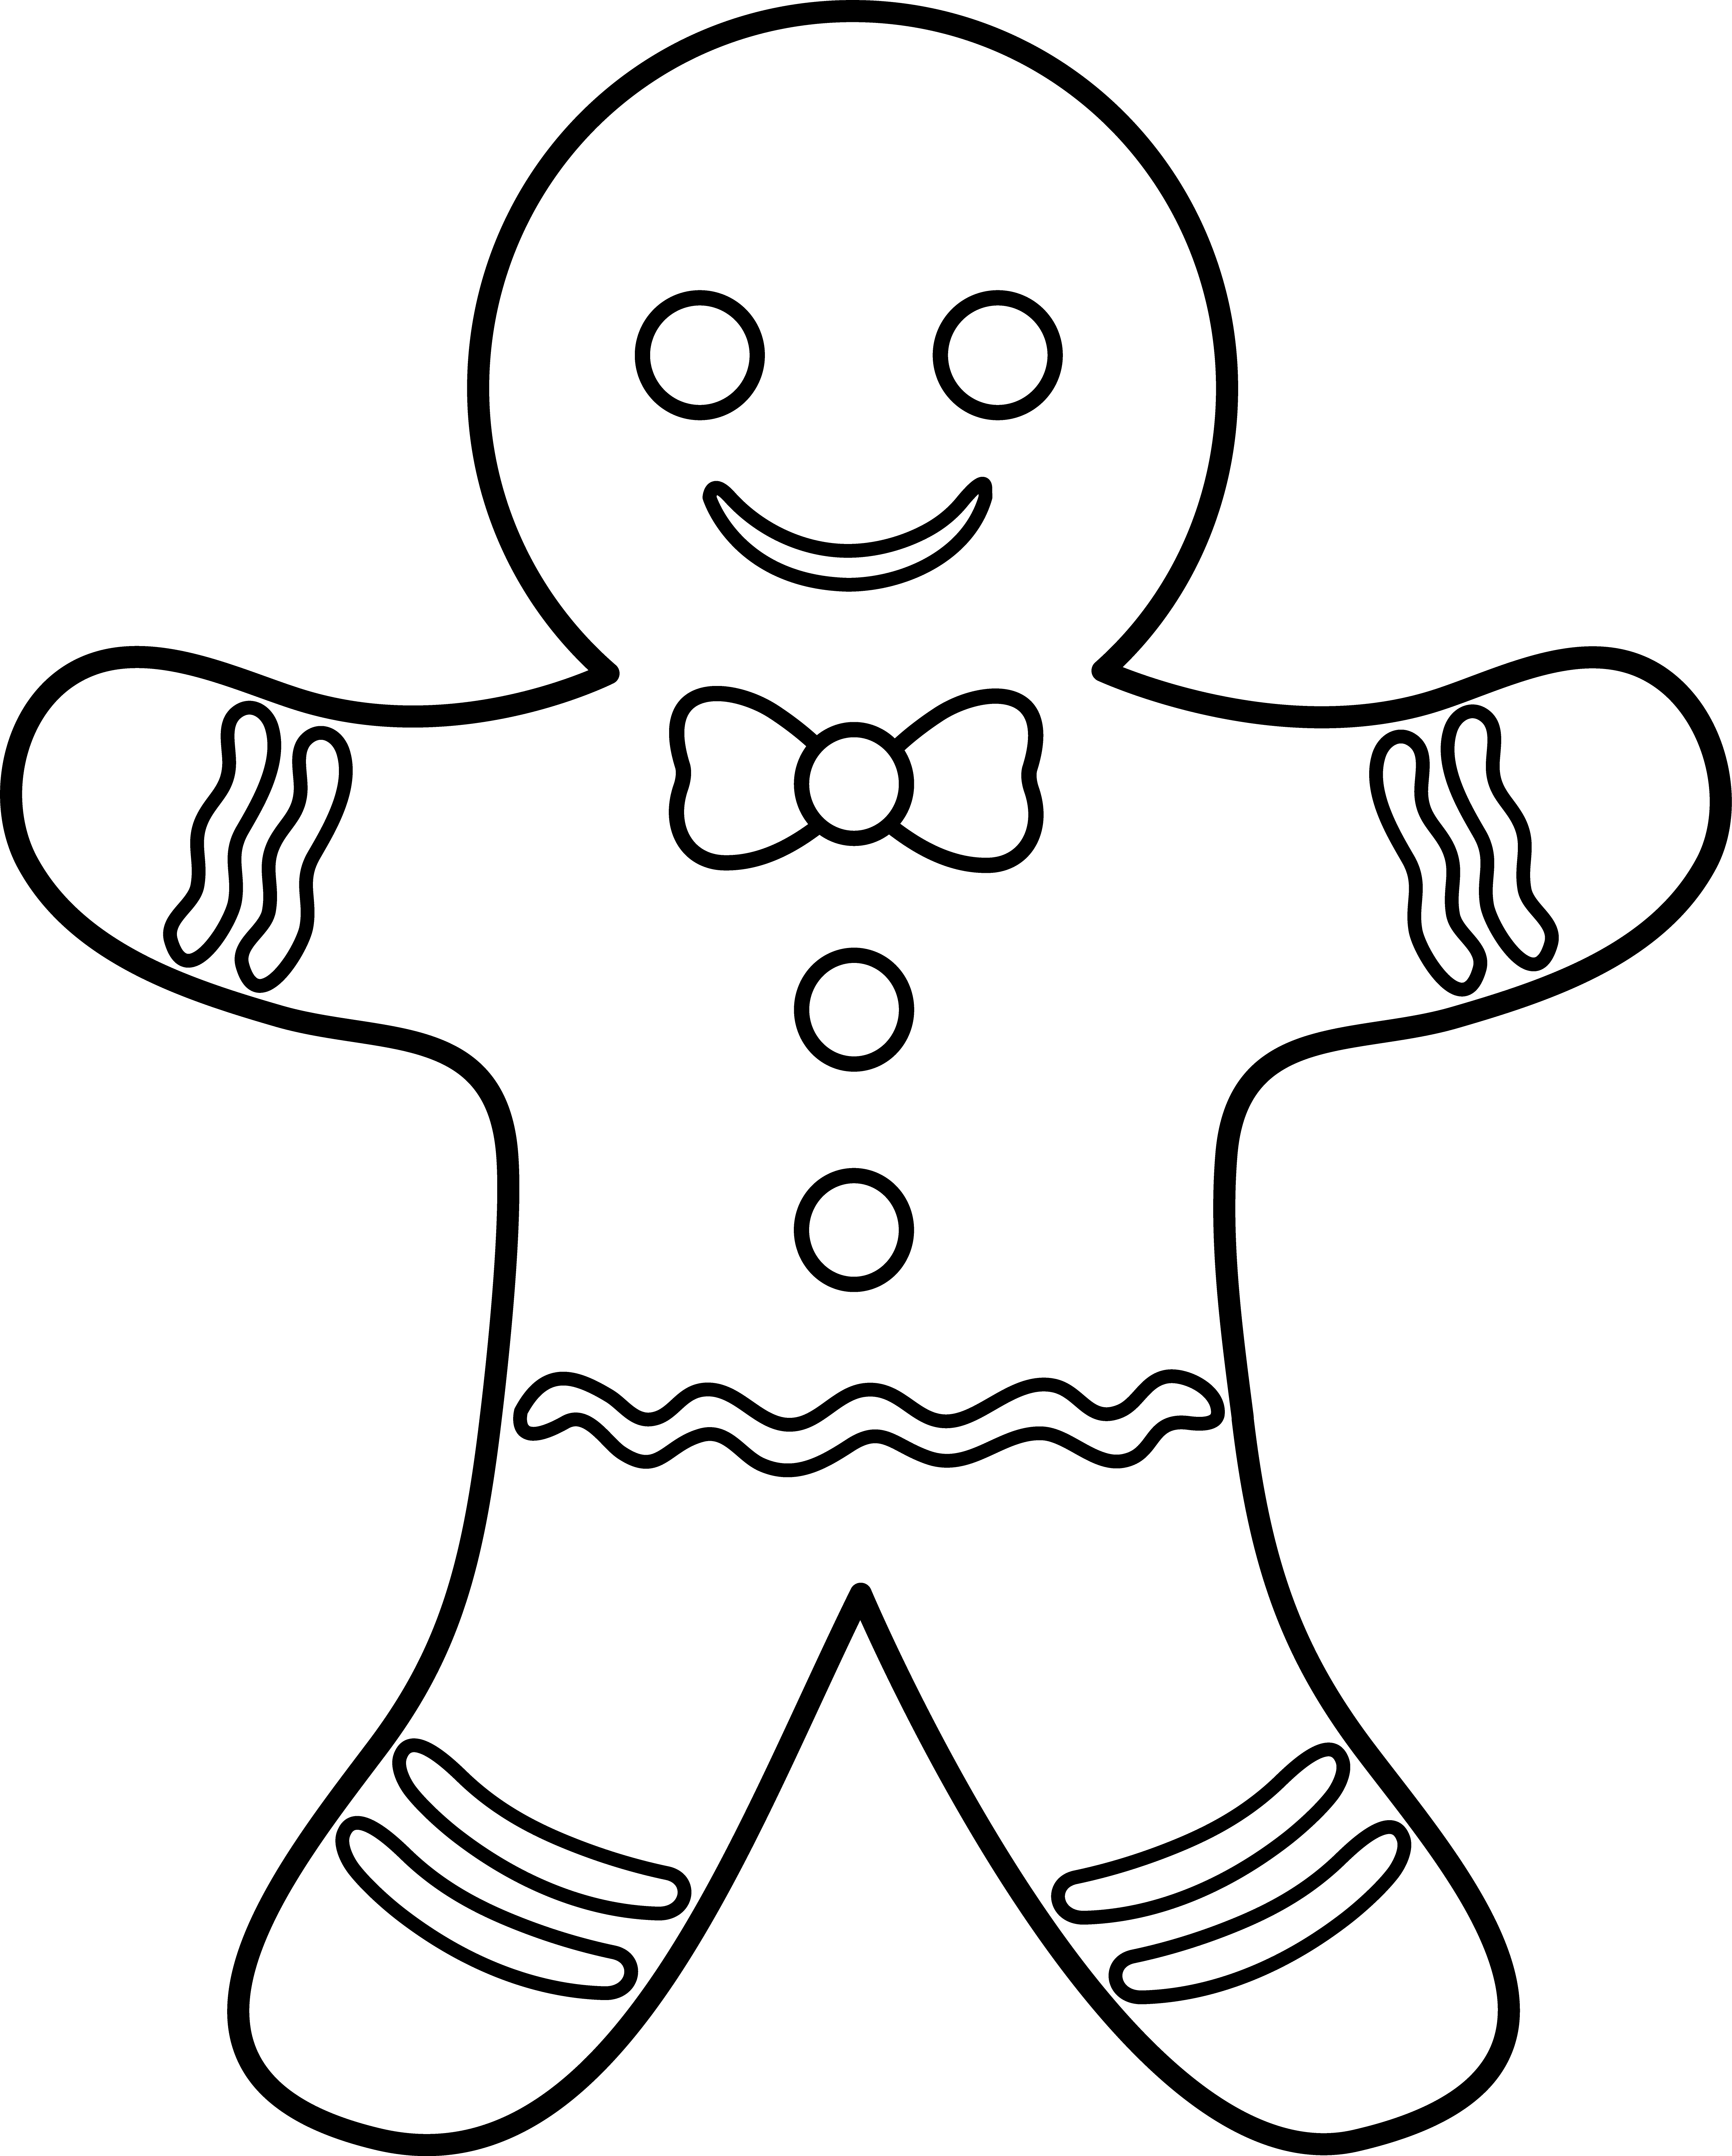 Ginger Bread Man Outline